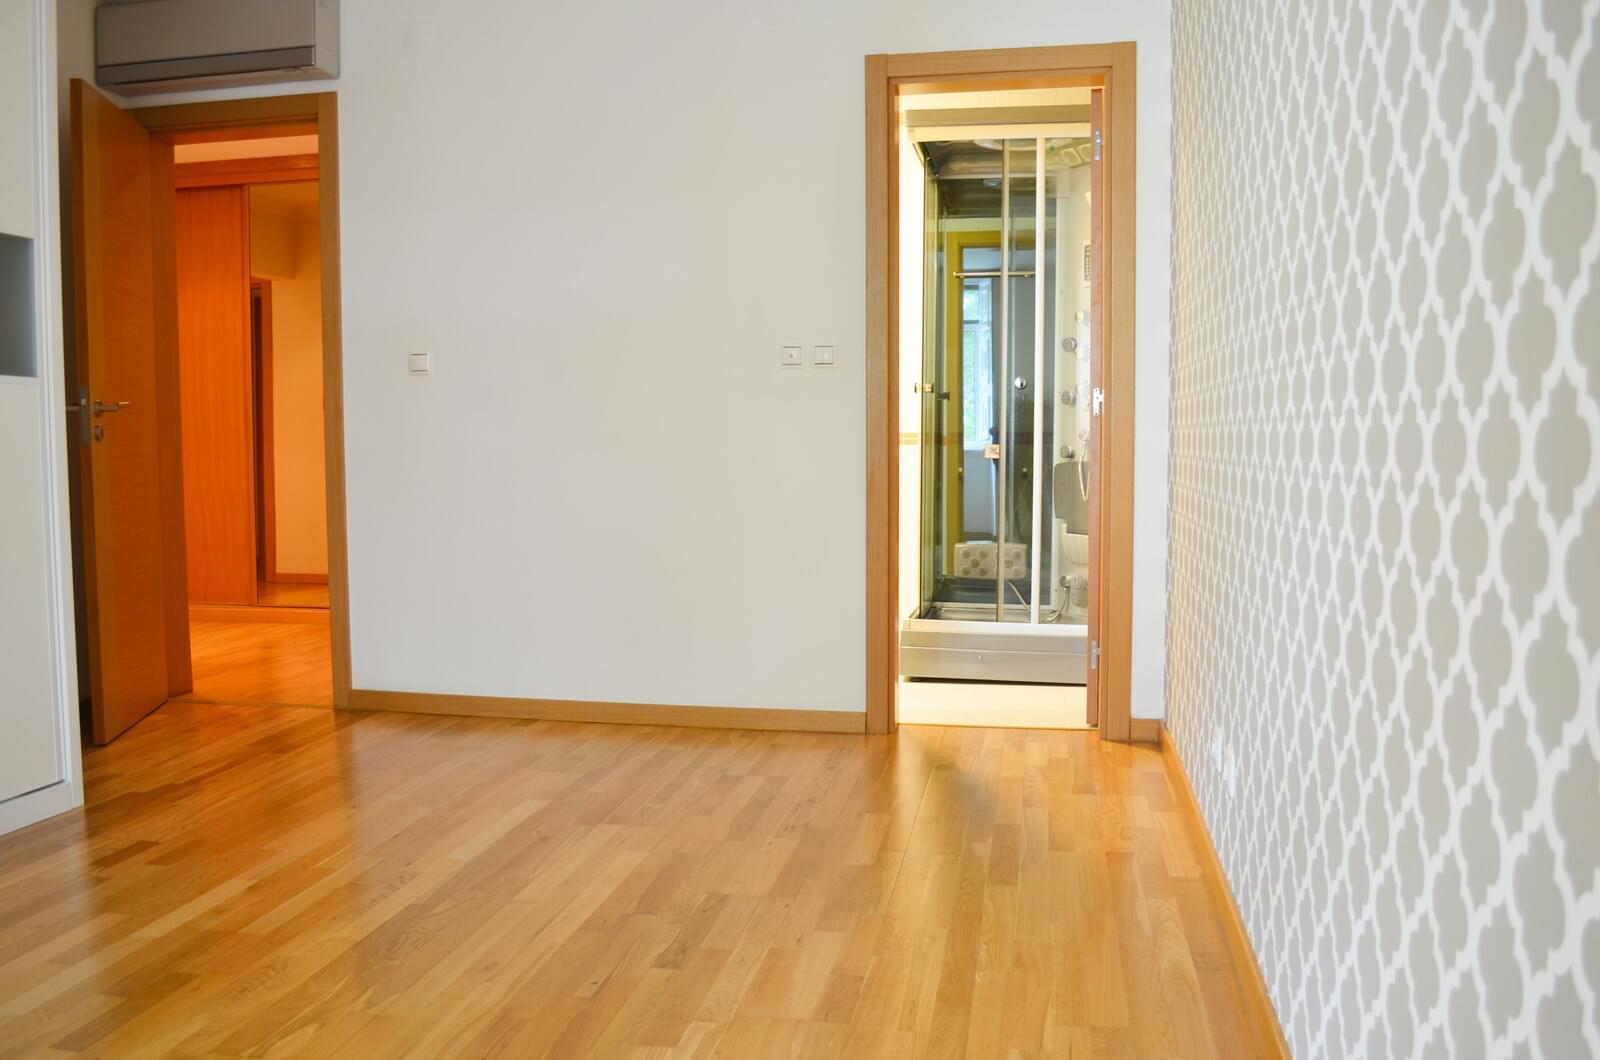 pf18839-apartamento-t2-lisboa-67c0280a-d649-409a-b994-a99f83ce119b